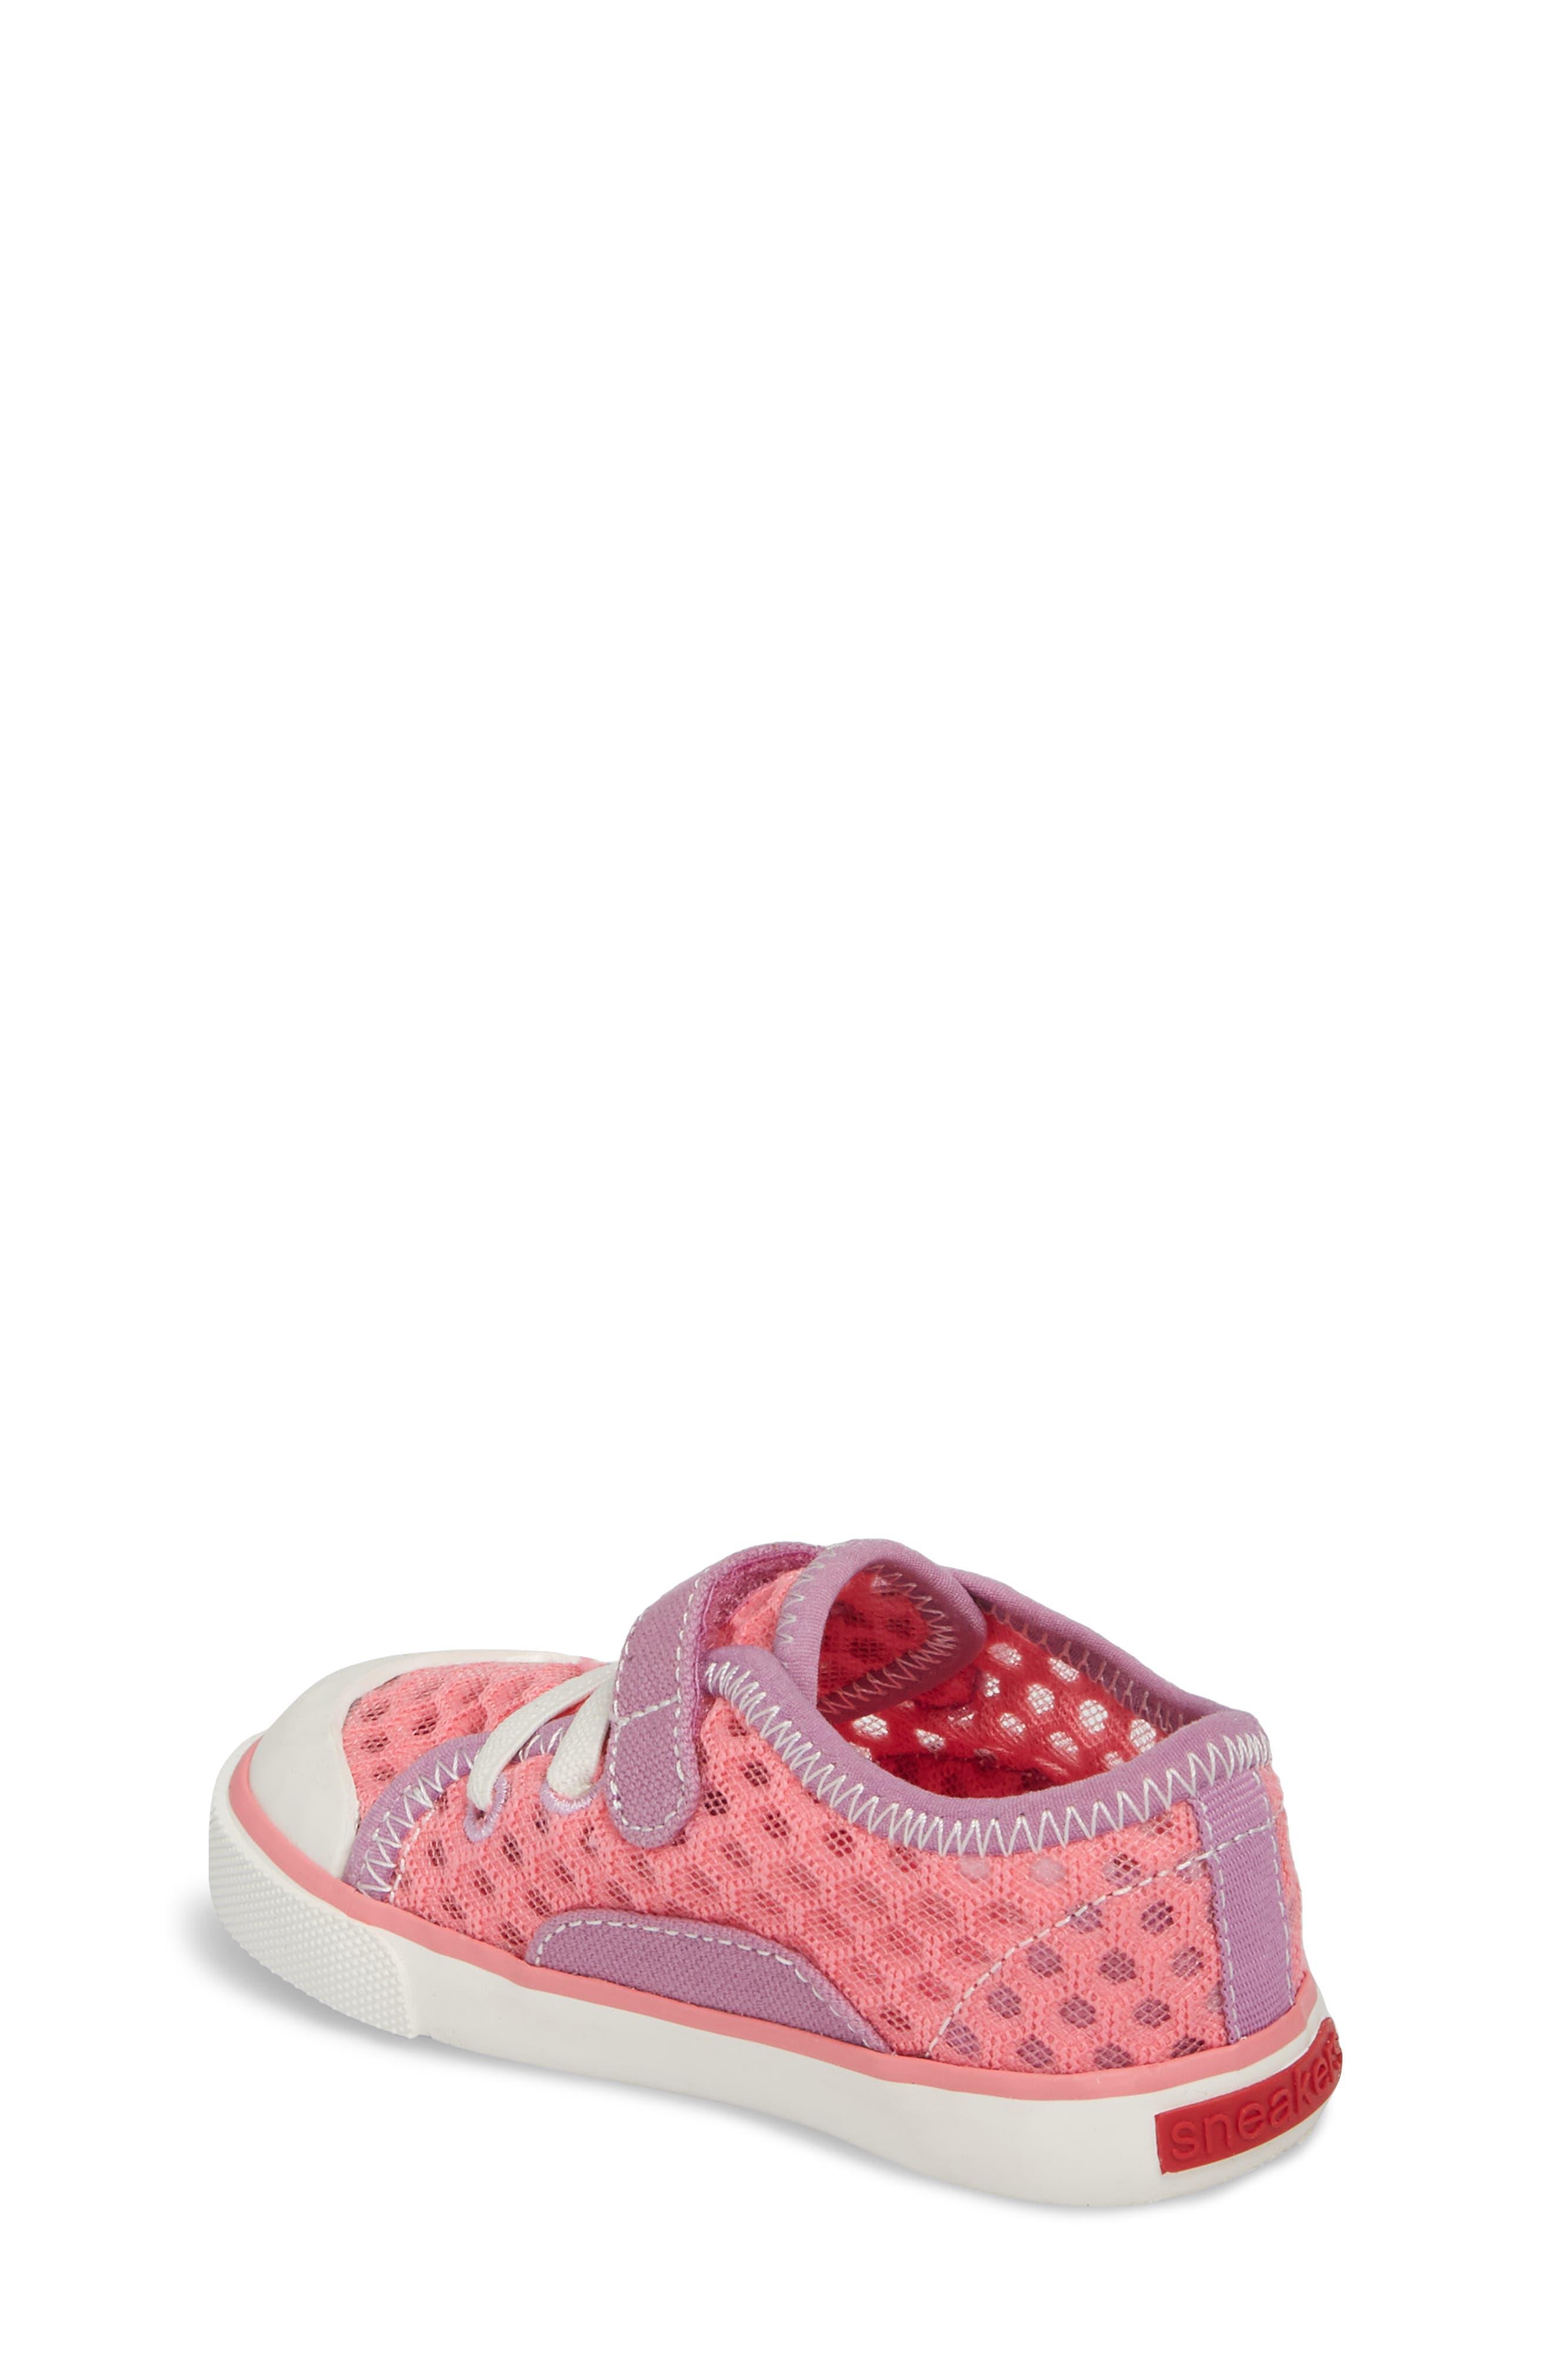 Saylor Sneaker,                             Alternate thumbnail 2, color,                             Hot Pink